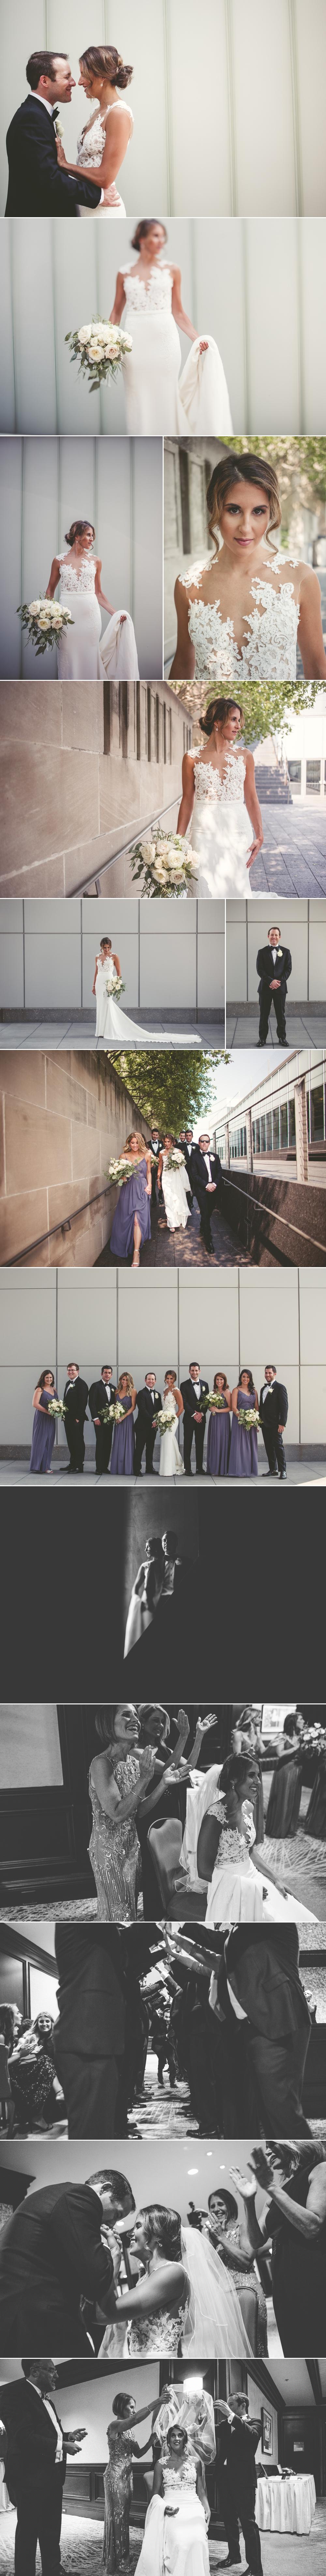 jason_domingues_photography_best_kansas_city_wedding_photographer_jewish_intercontinental_hotel_0003.JPG